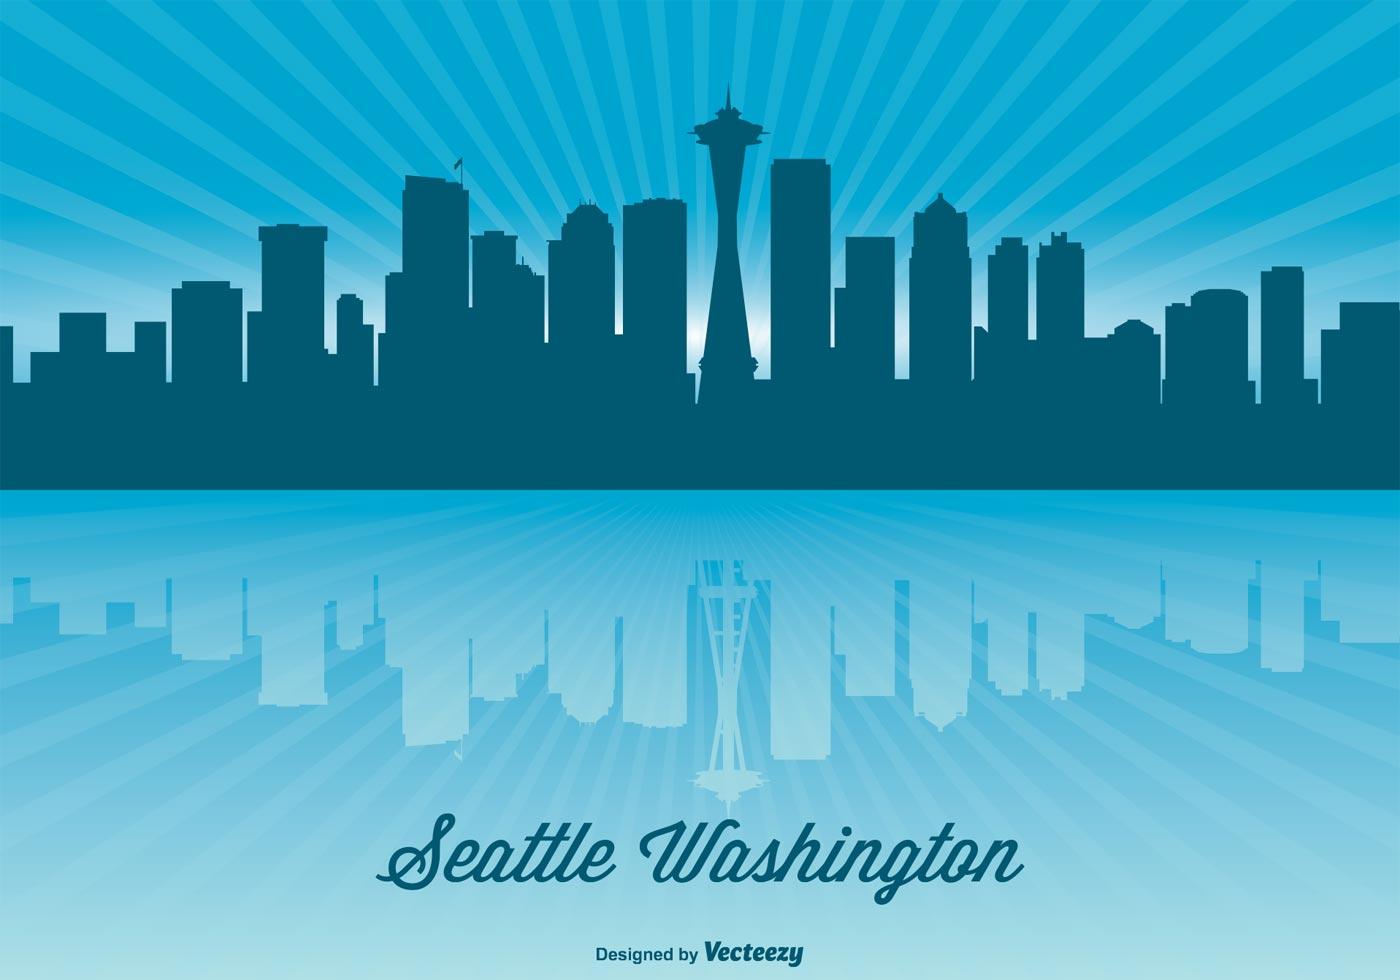 Stylized Mountain Seattle Skyline Outline Frasier Seattle Skyline Free Vector Art Free Seattle Skyline Outline houzz 01 Seattle Skyline Outline